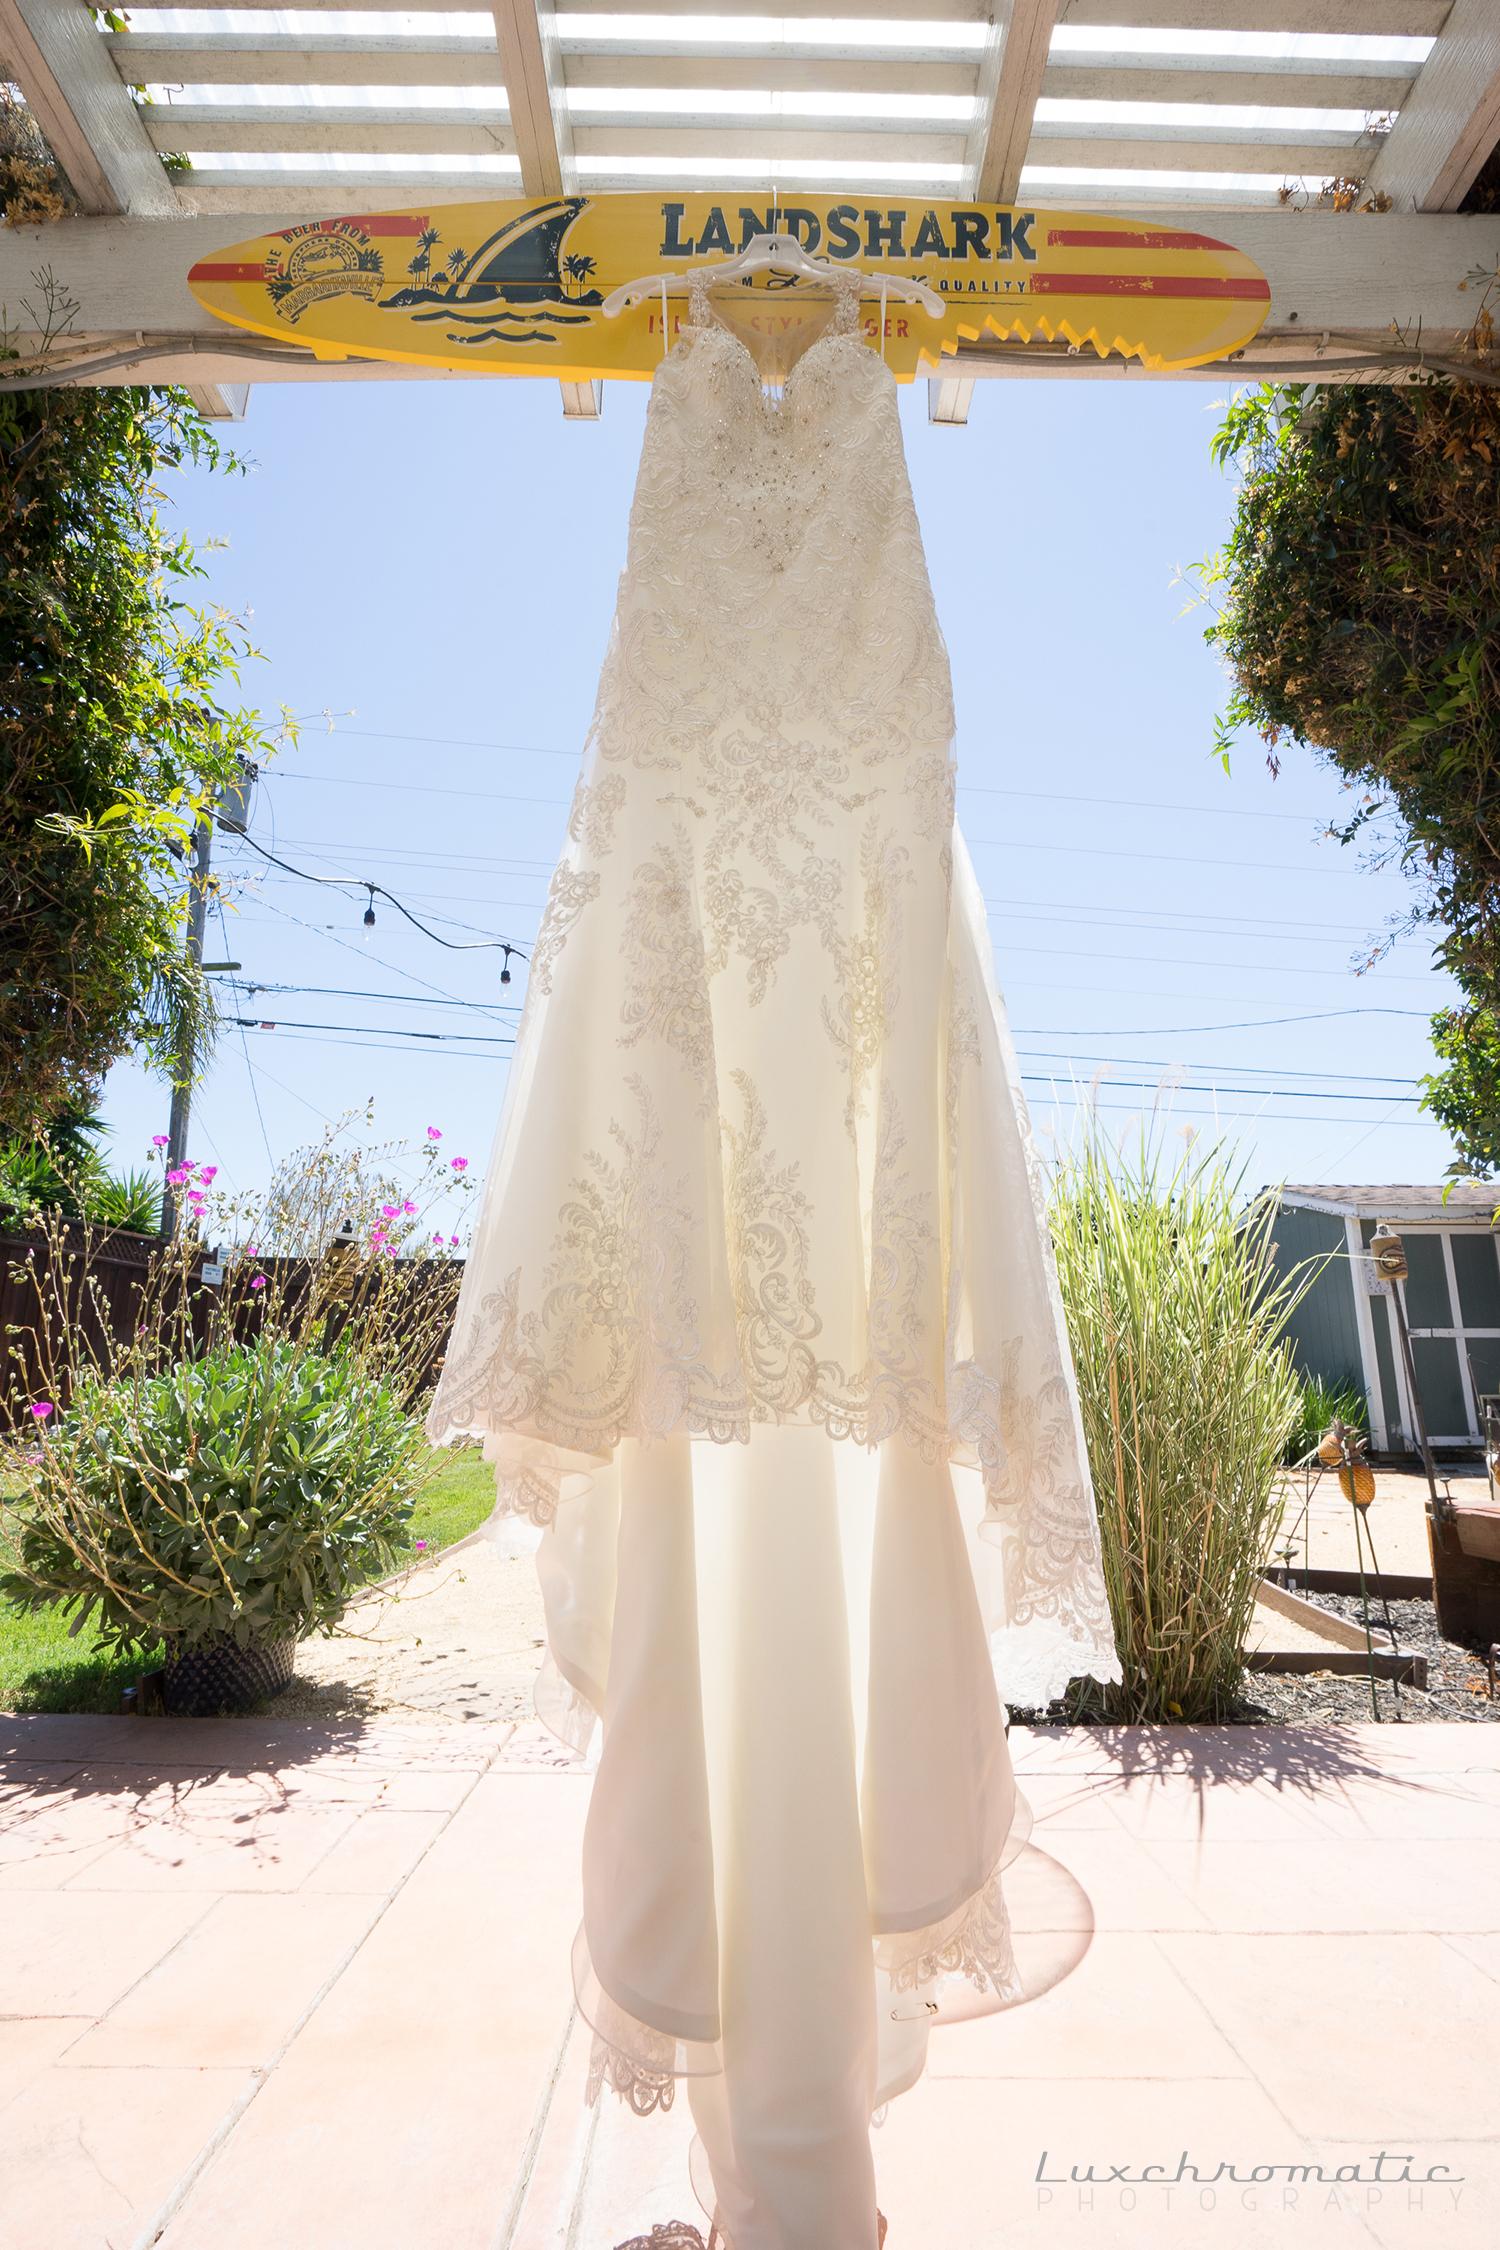 052017_Natalie_Travis-1030-San-Francisco-Bay-Area-Fremont-East-Bay-Wedding-Church-Hotel-Silicon-Valley-Bride-Gown-Dress-Groom-Luxchromatic-Portrait-Sony-Alpha-a7Rii-Interfit-Profoto-Photographer-Photography.jpg